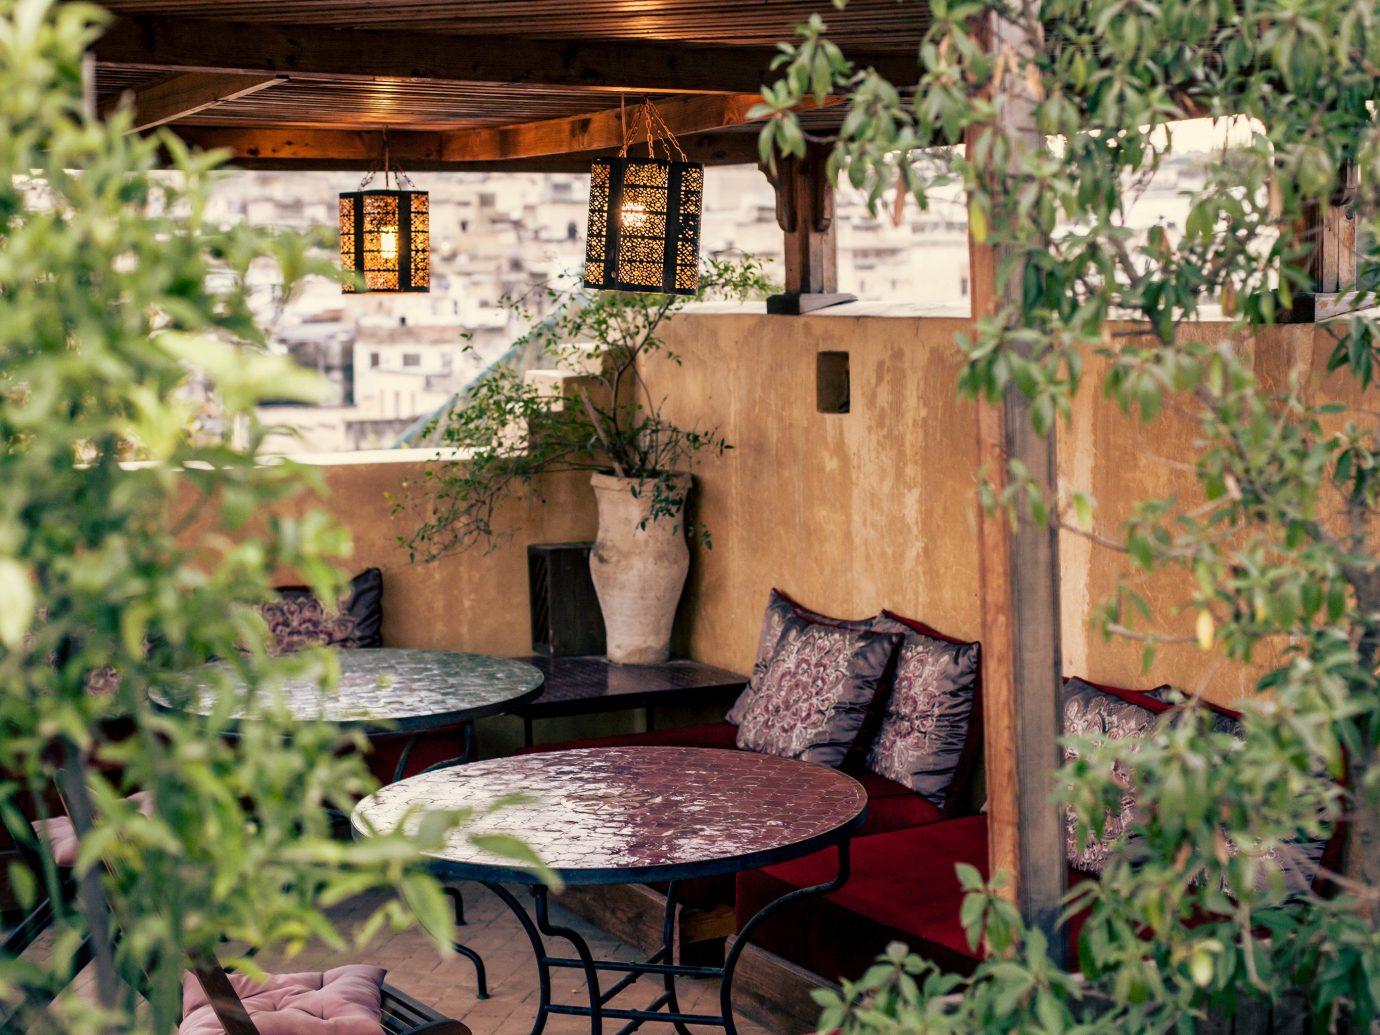 Hotels outdoor house backyard yard Garden home Courtyard cottage estate outdoor structure flower plant furniture